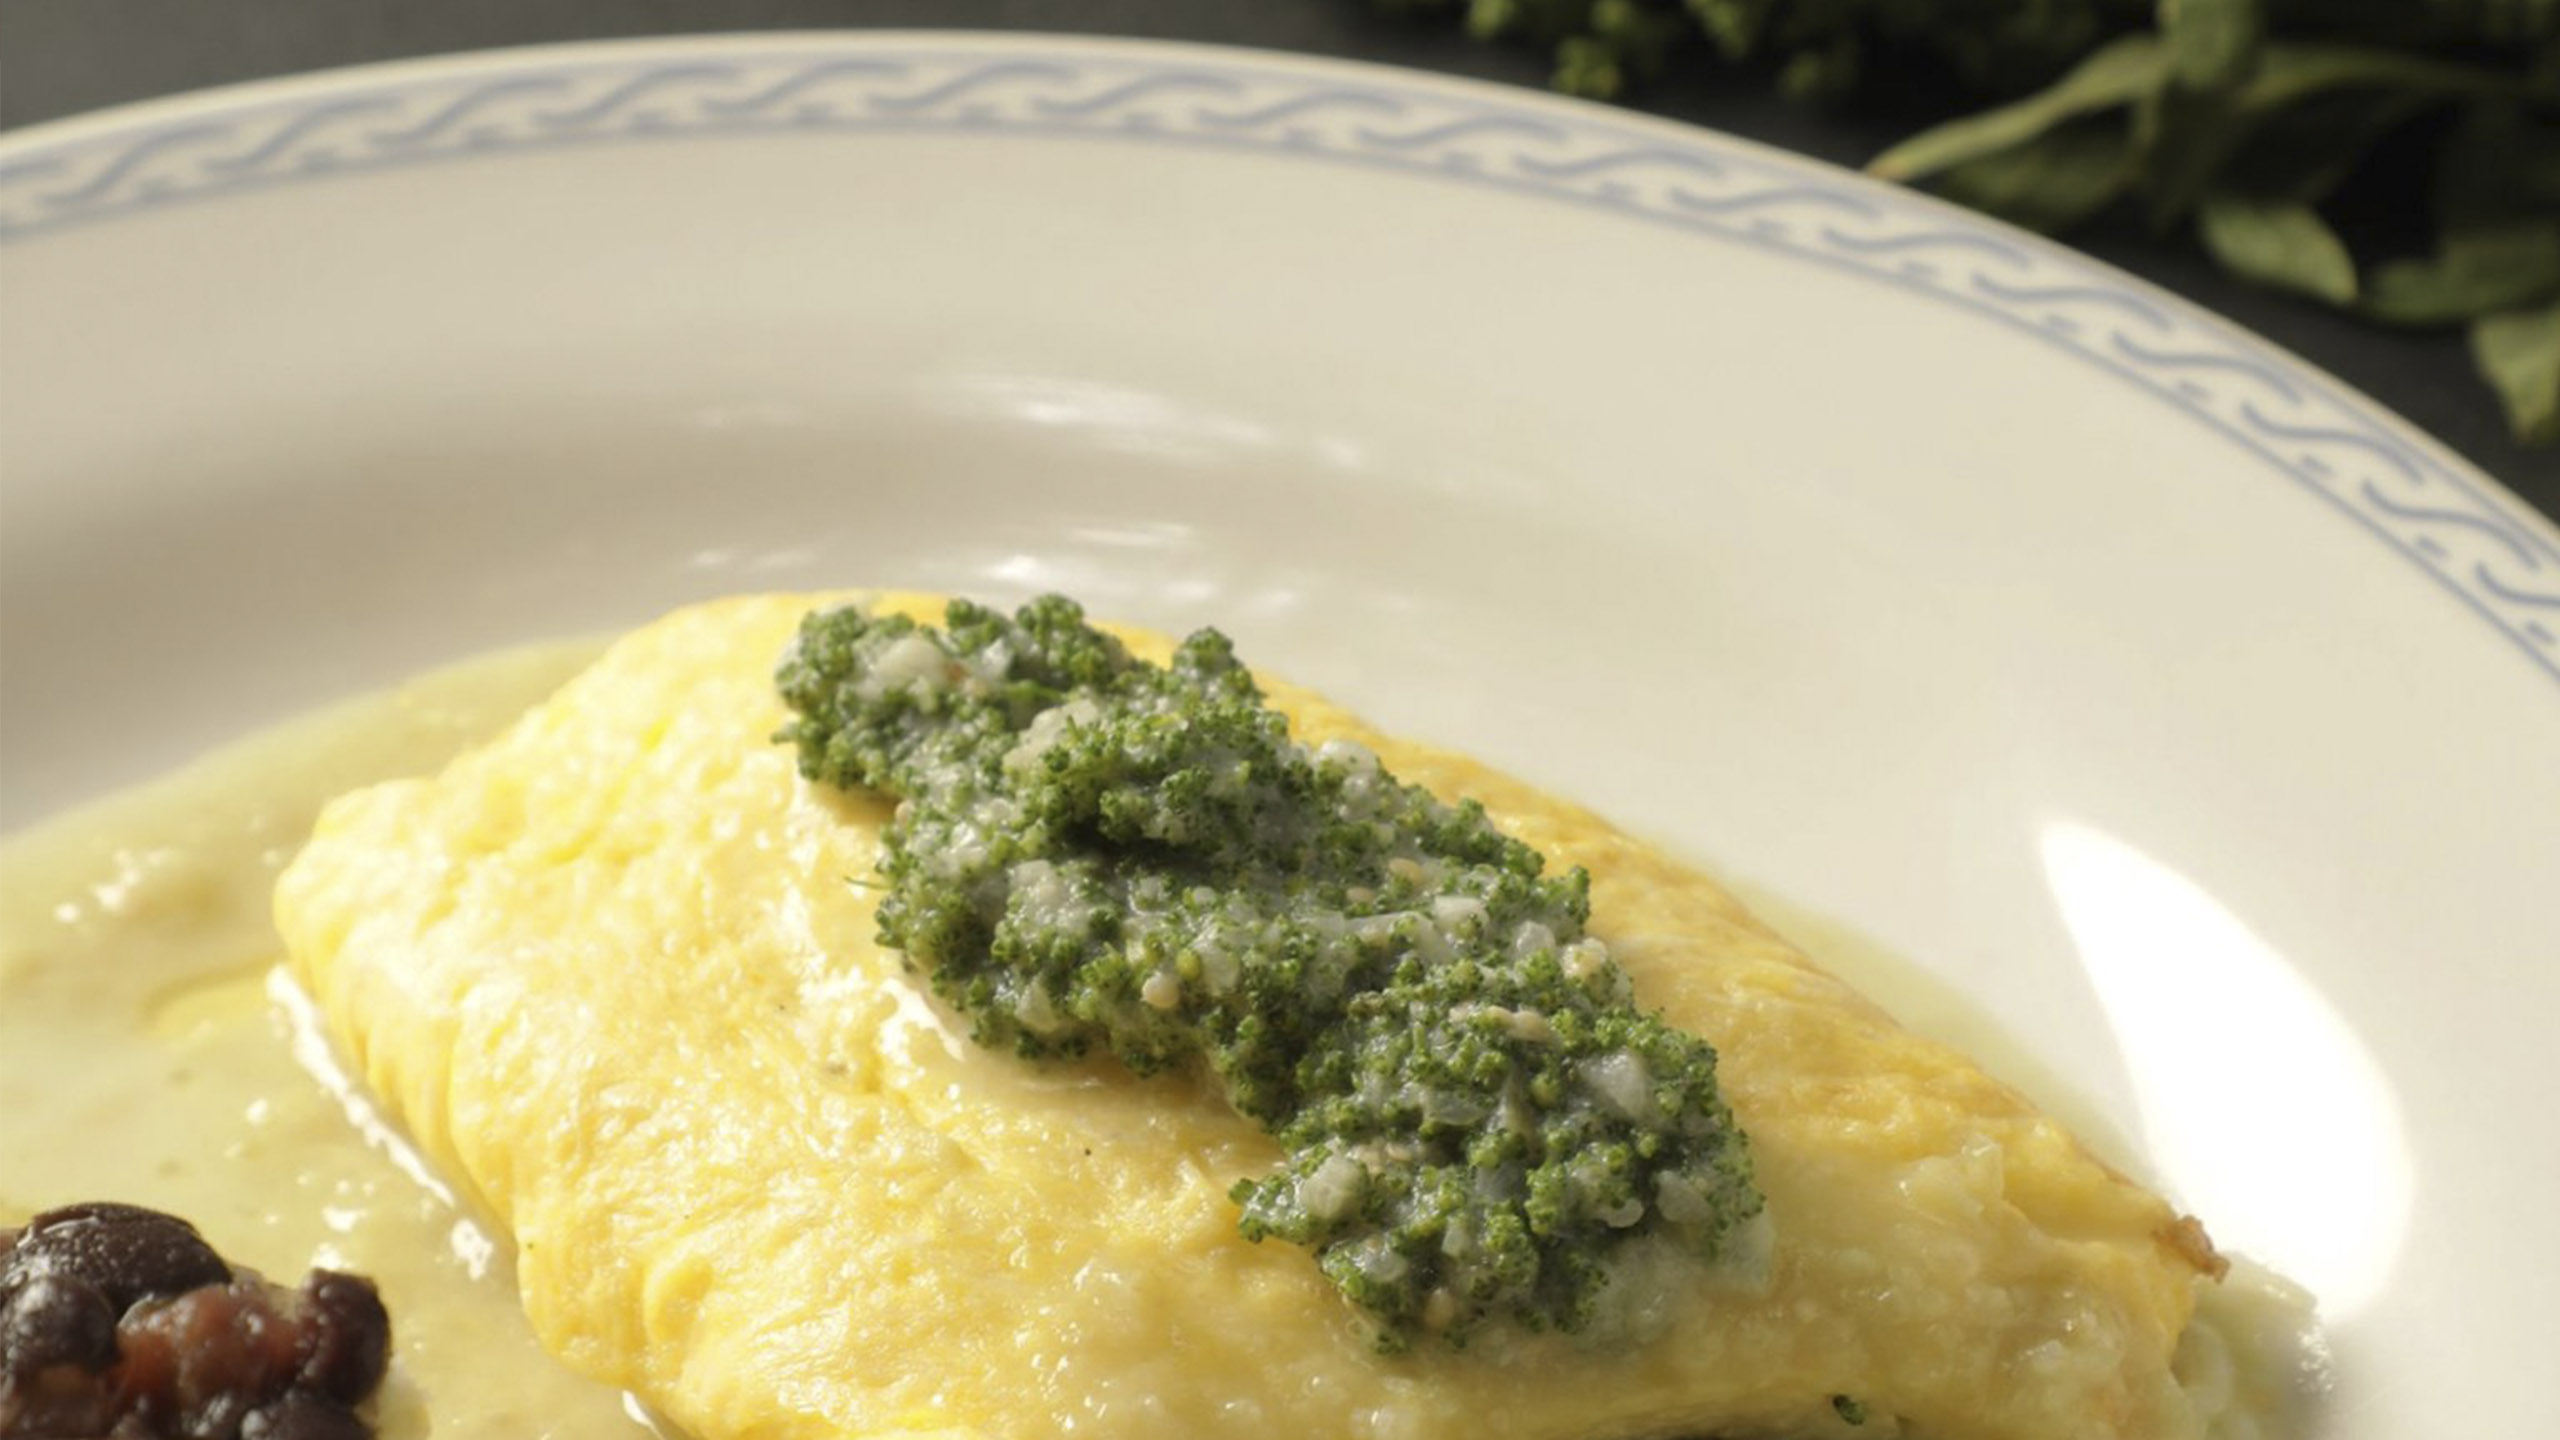 omelette, receta de omelette con huauzontle